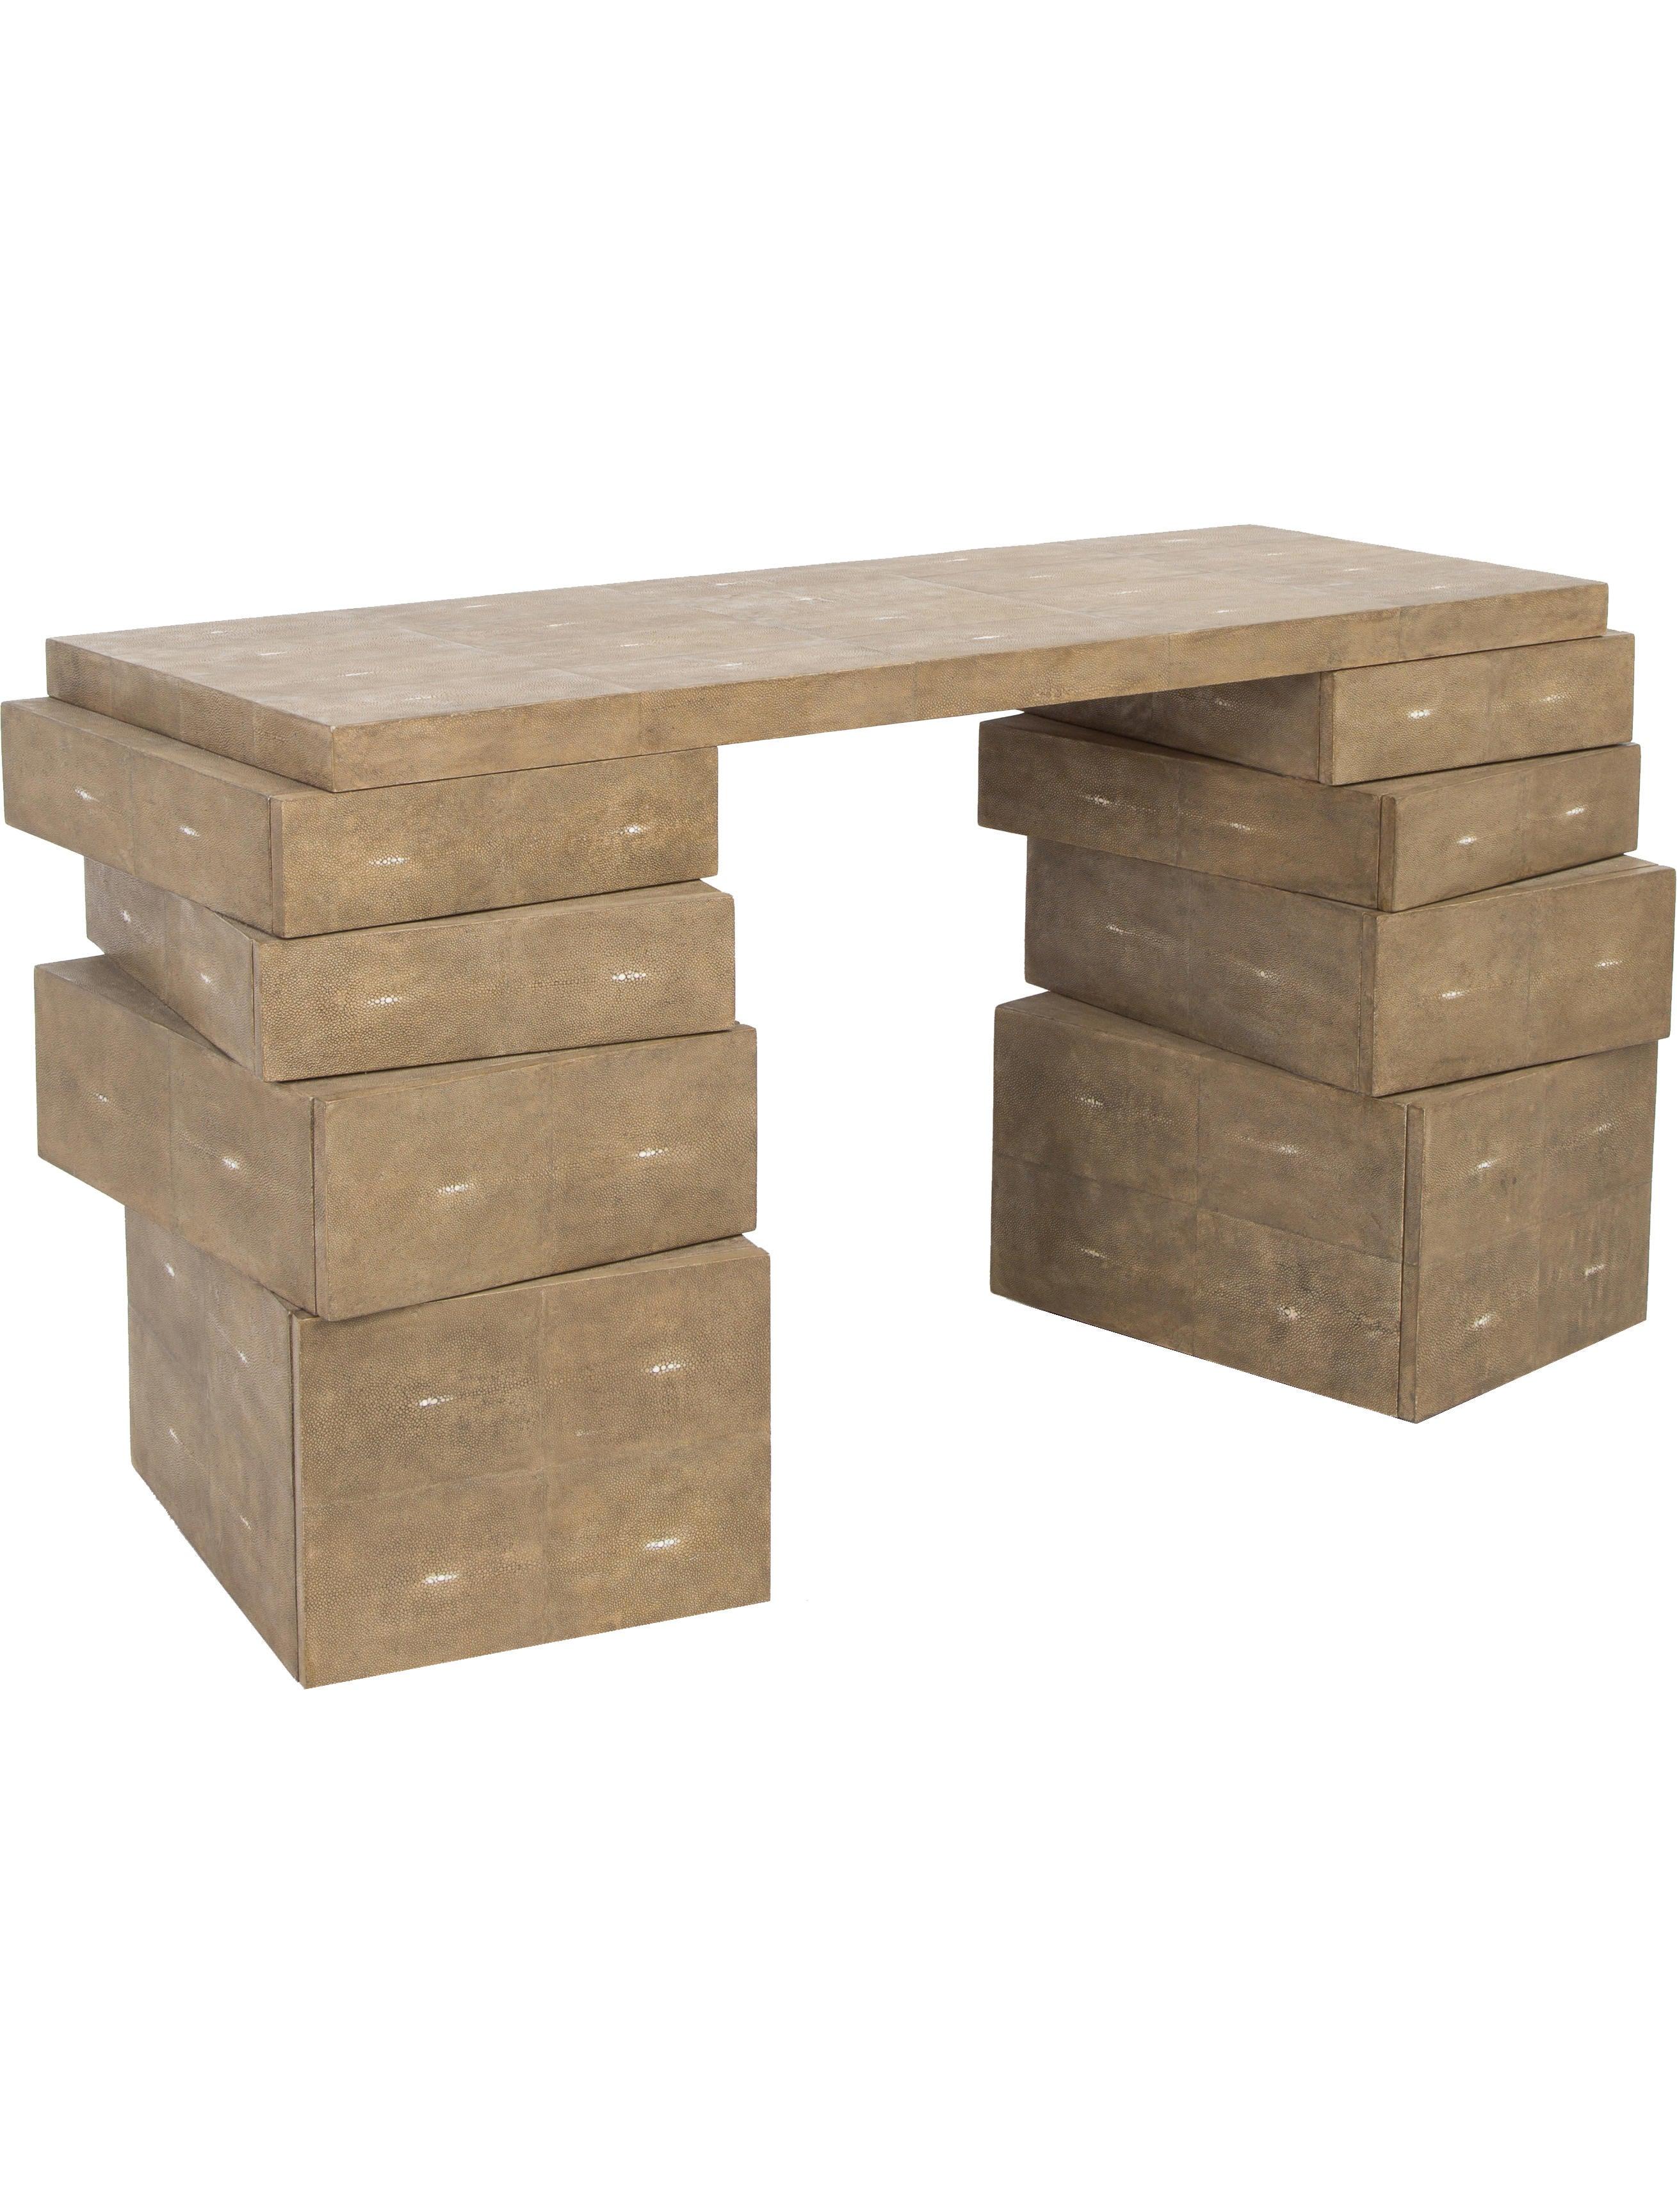 R Y Augousti Shagreen Desk Furniture Ray20199 The Realreal